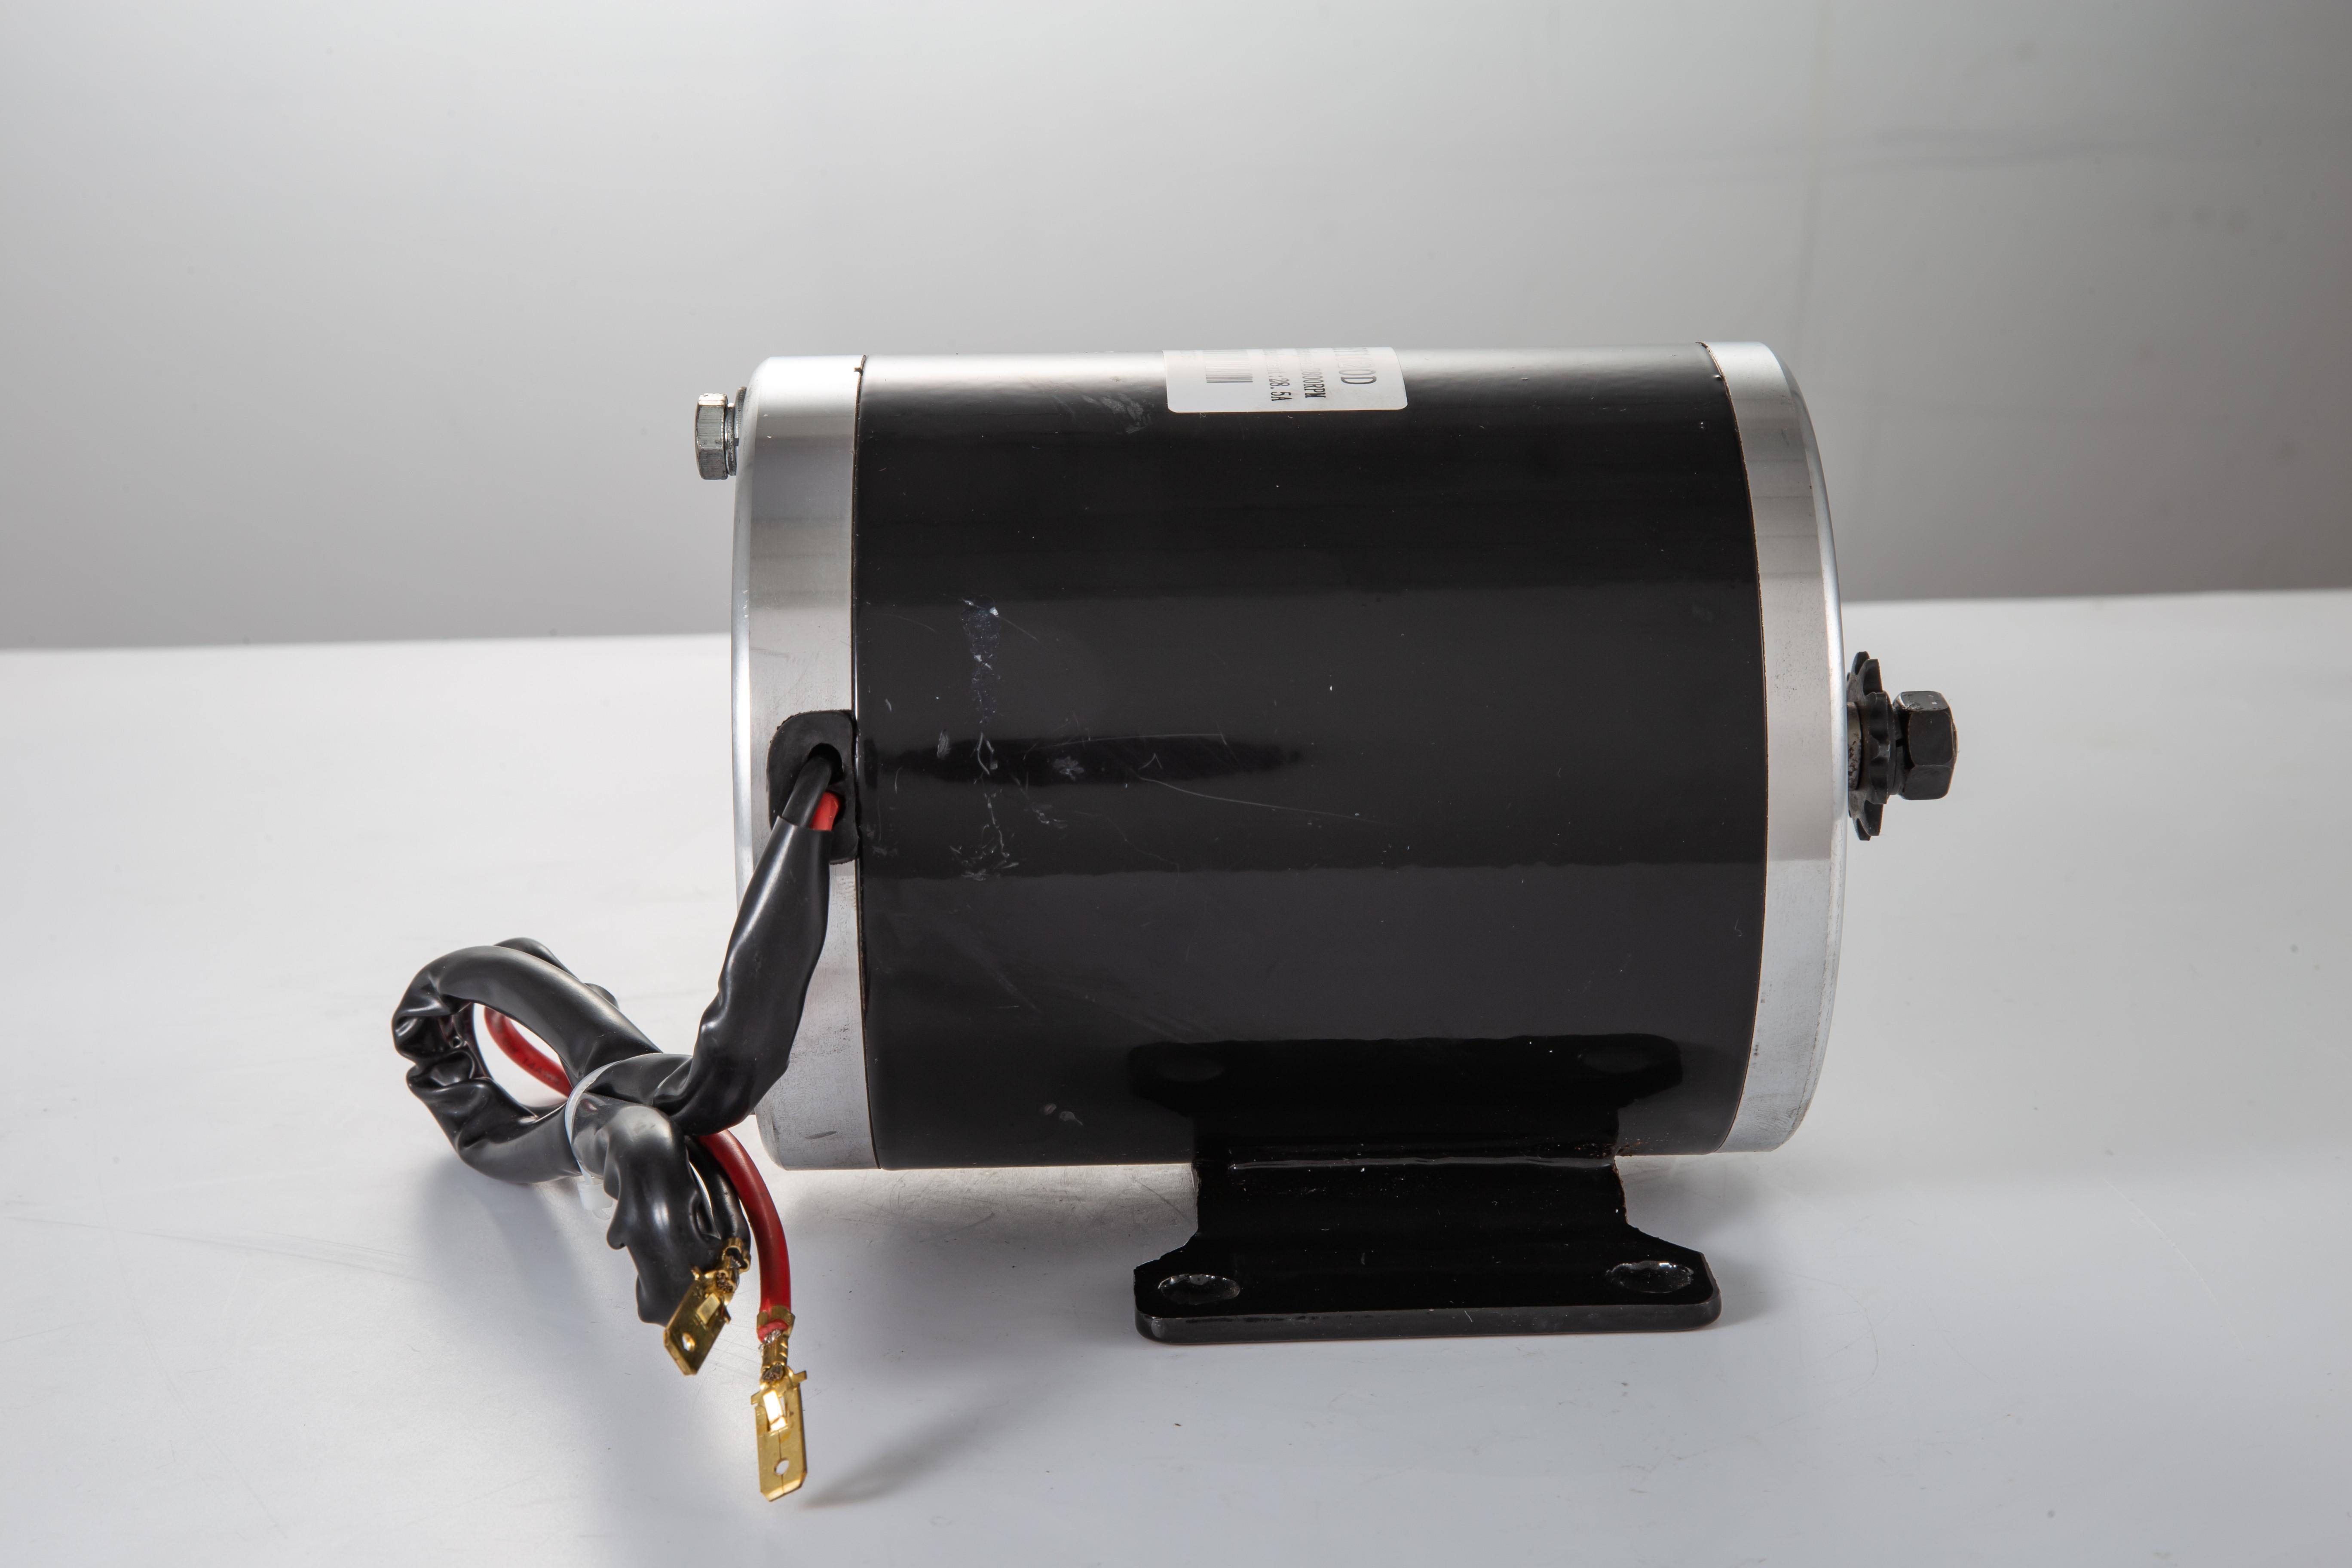 36v-Electric-Motor-controller-throttle-kit-f-Scooter-E-Scooter-ATV-Permanent thumbnail 117